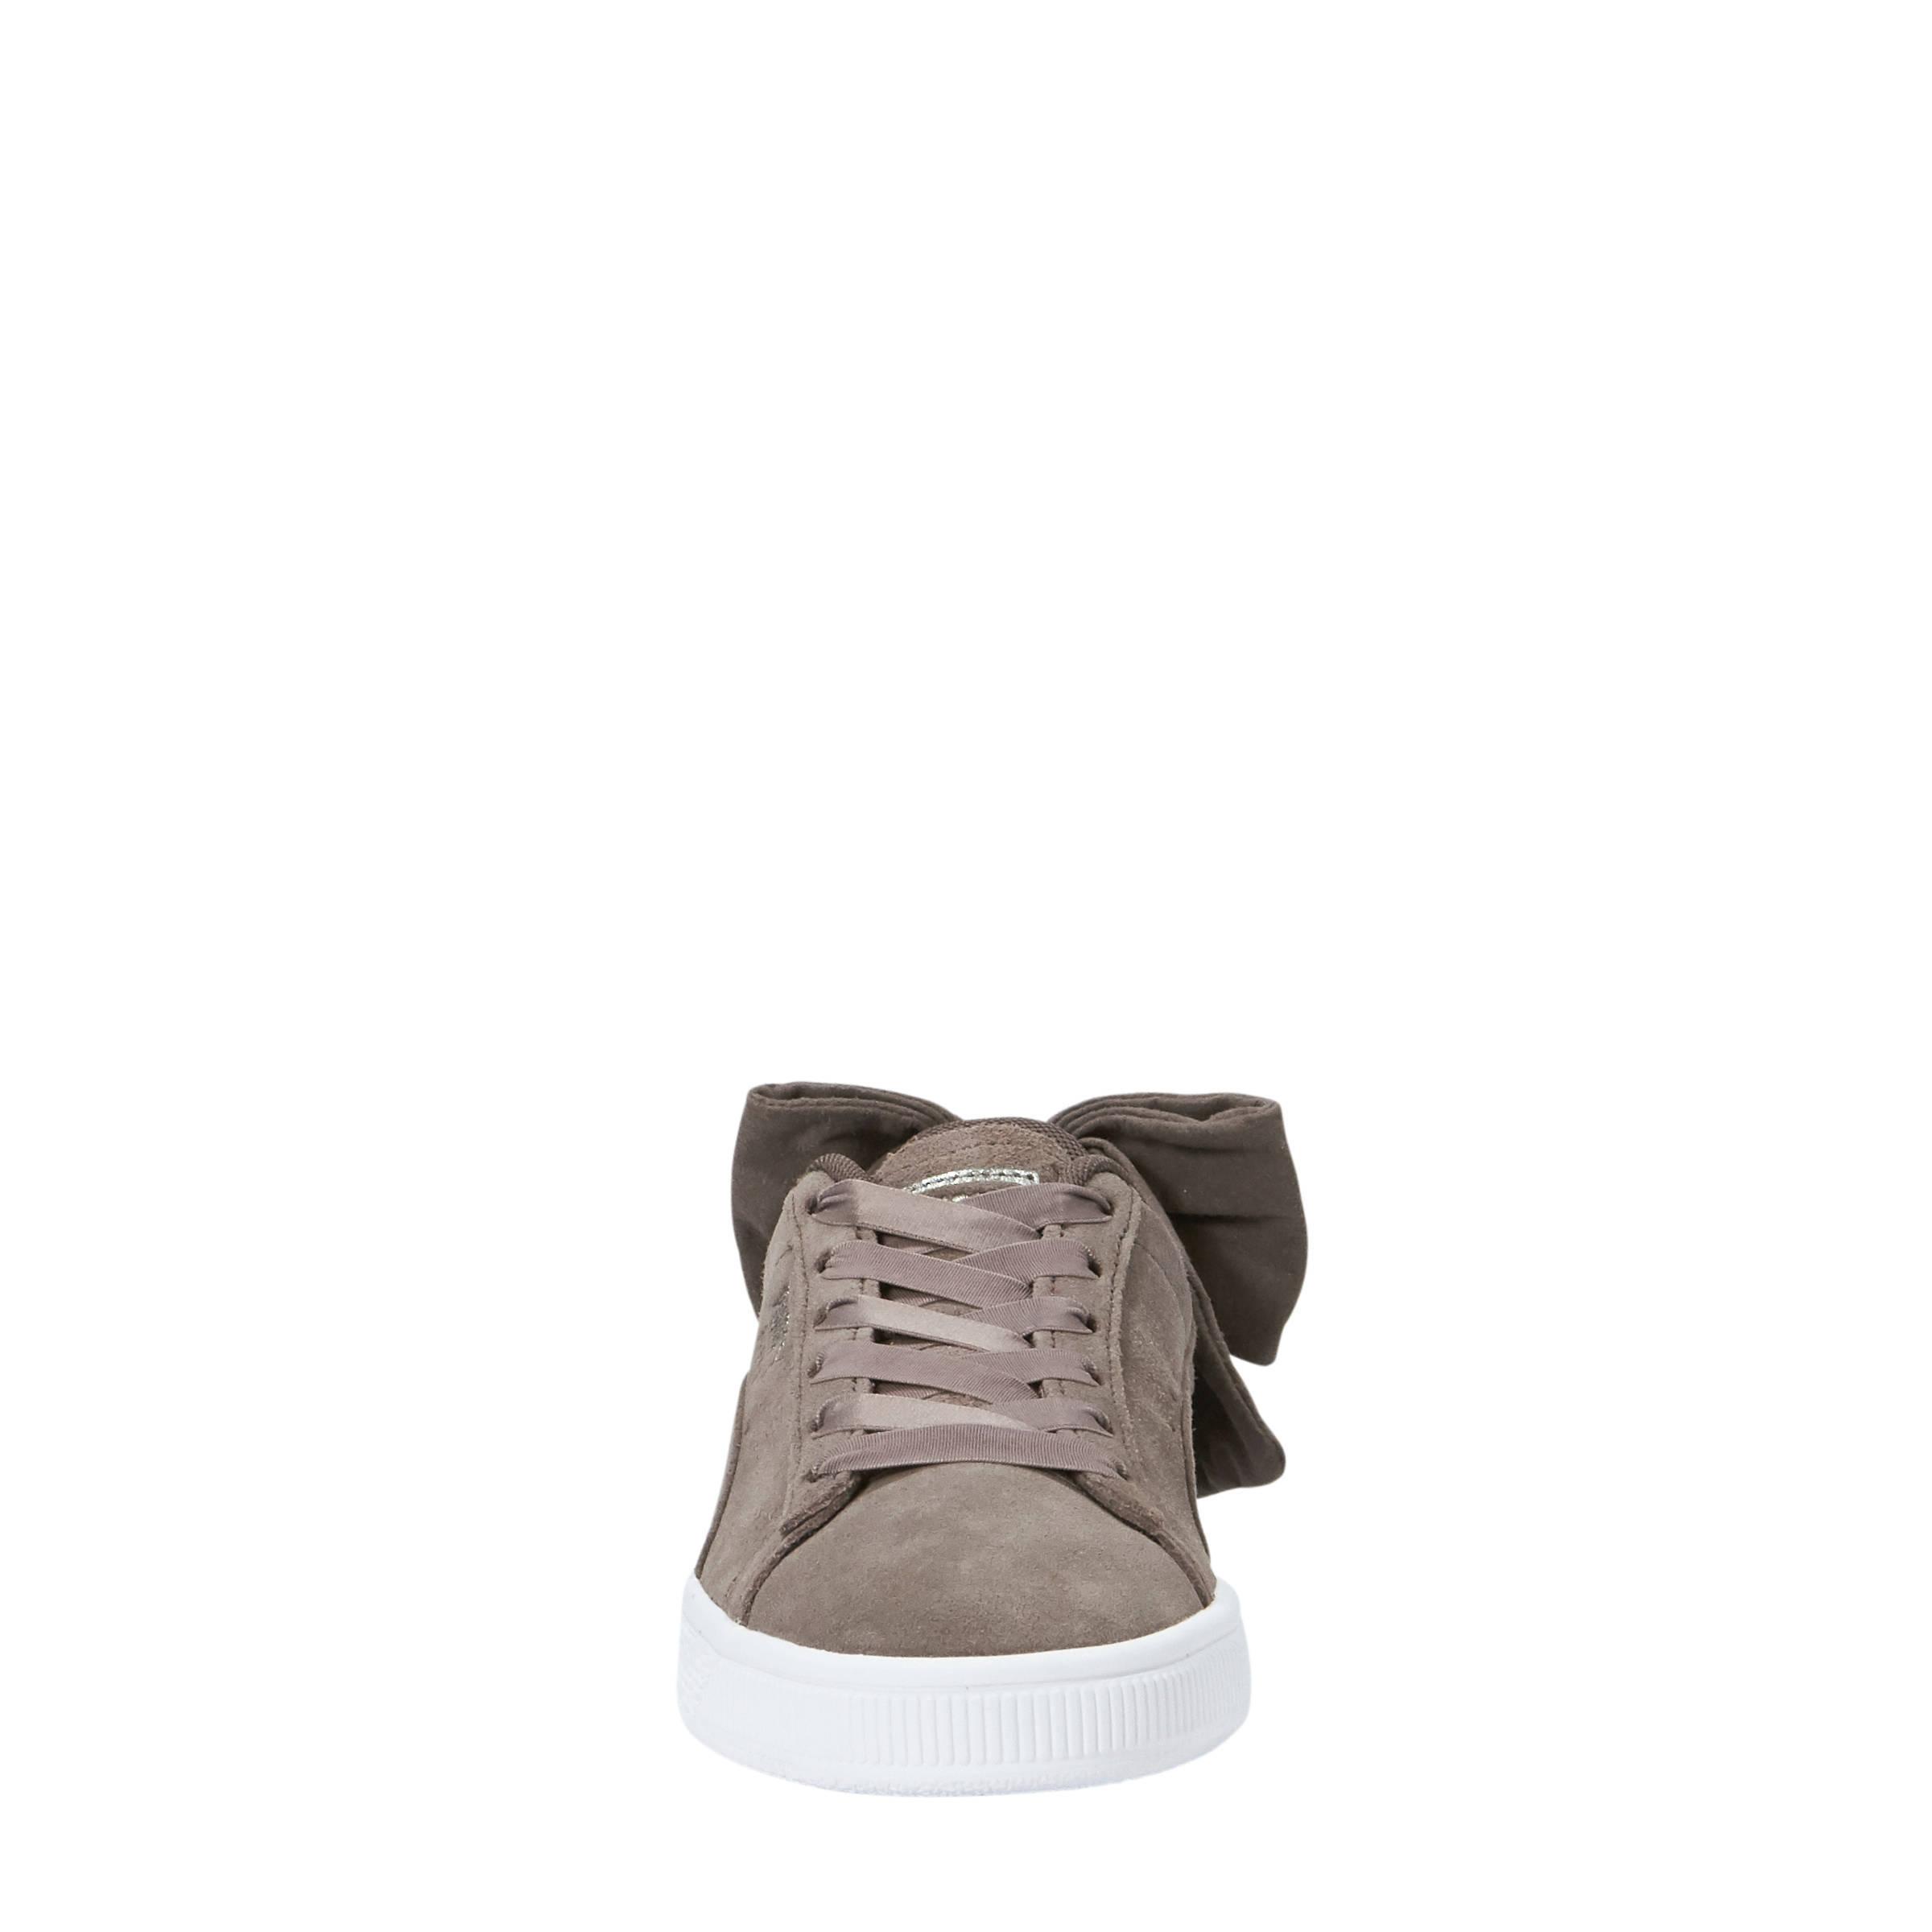 Puma Suède Bow sneakers mokka | wehkamp